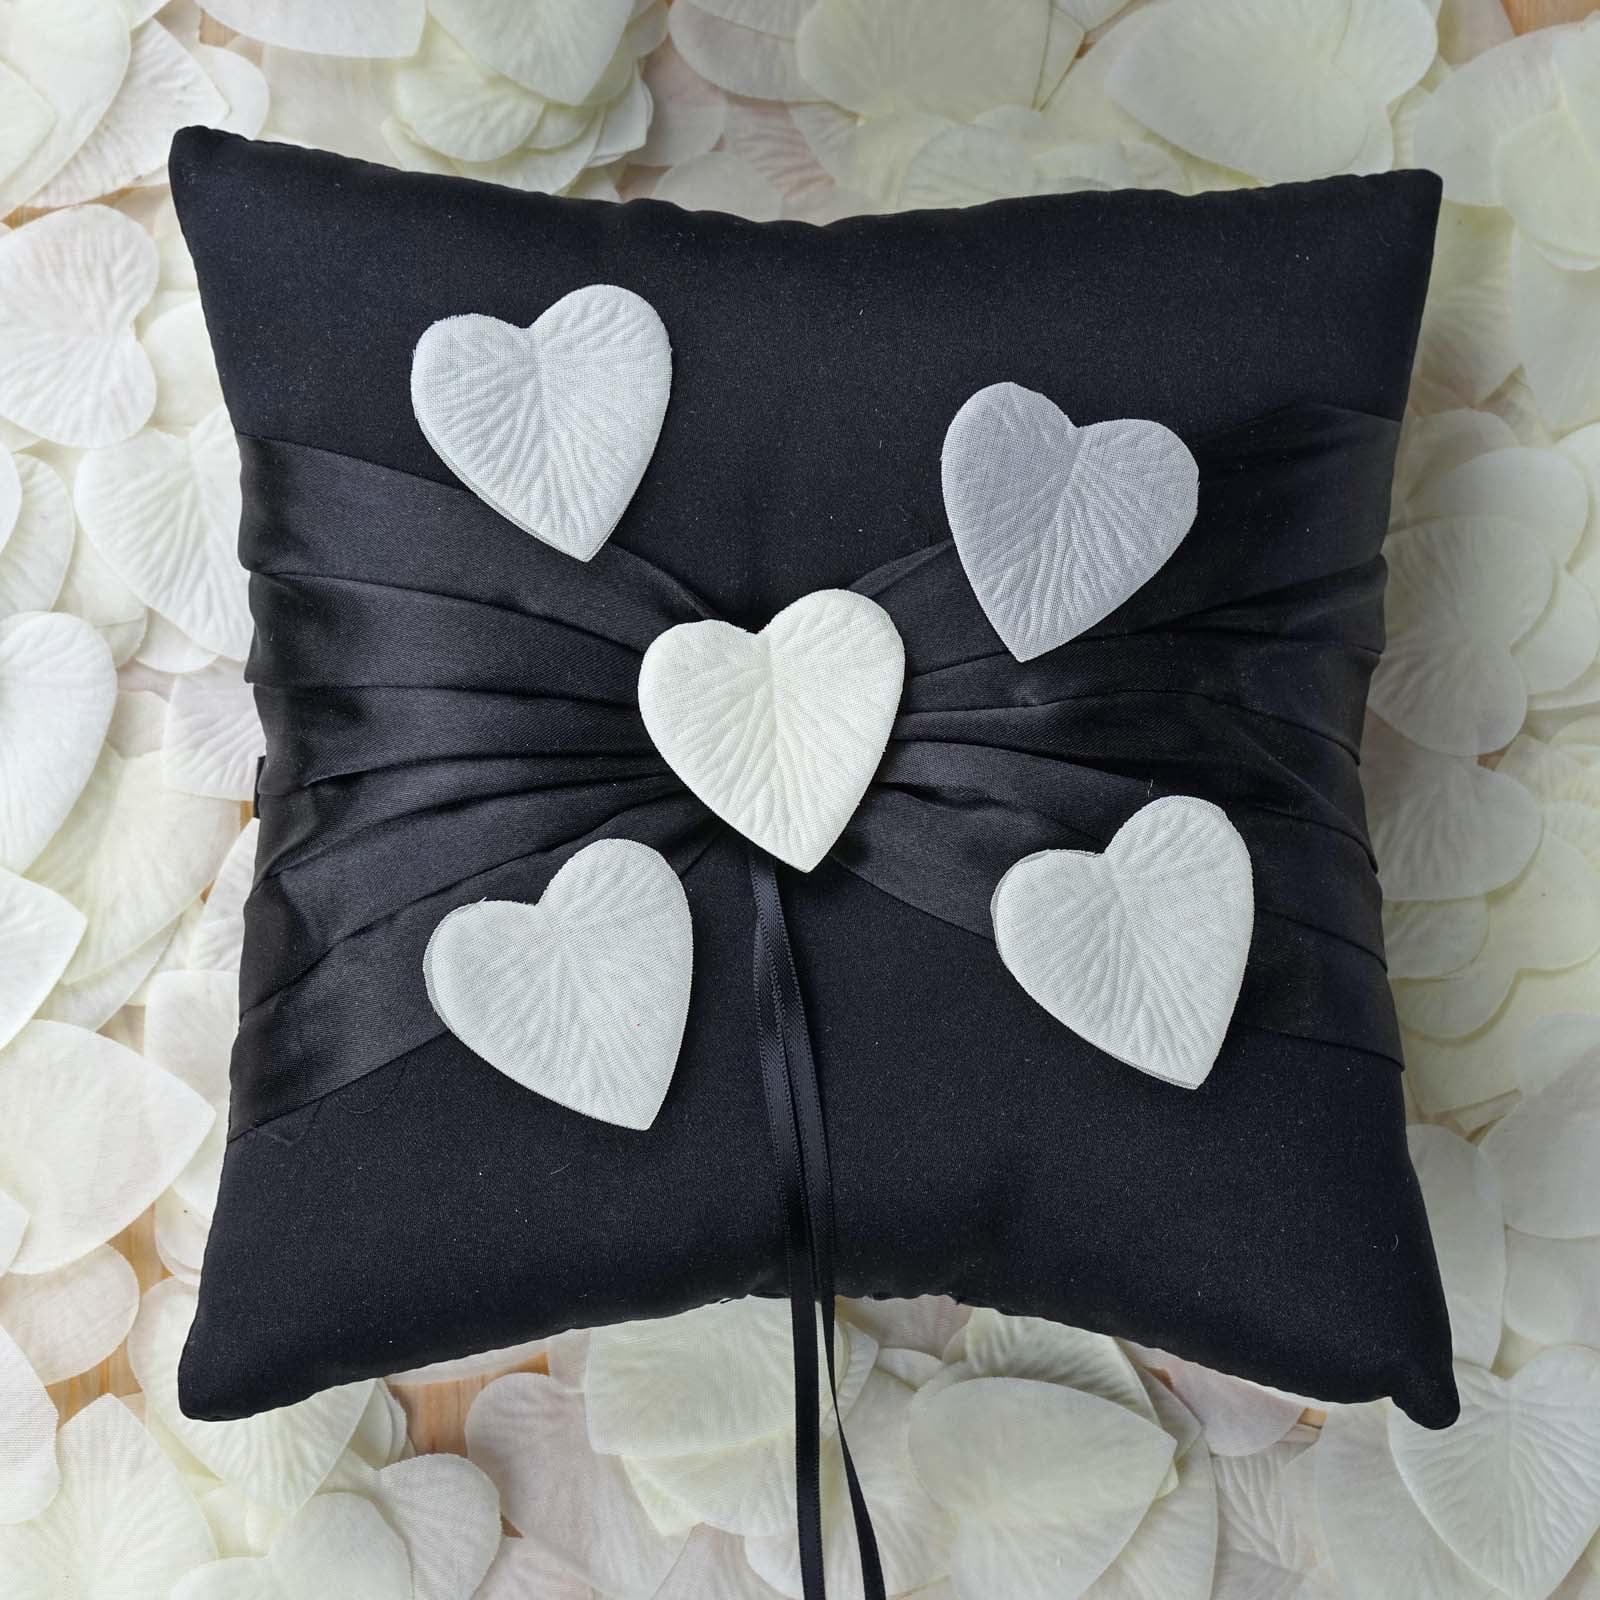 BalsaCircle 500 Heart Shaped Artificial Rose Petals - Wedding Party Event Centerpieces Vases Decorations Supplies